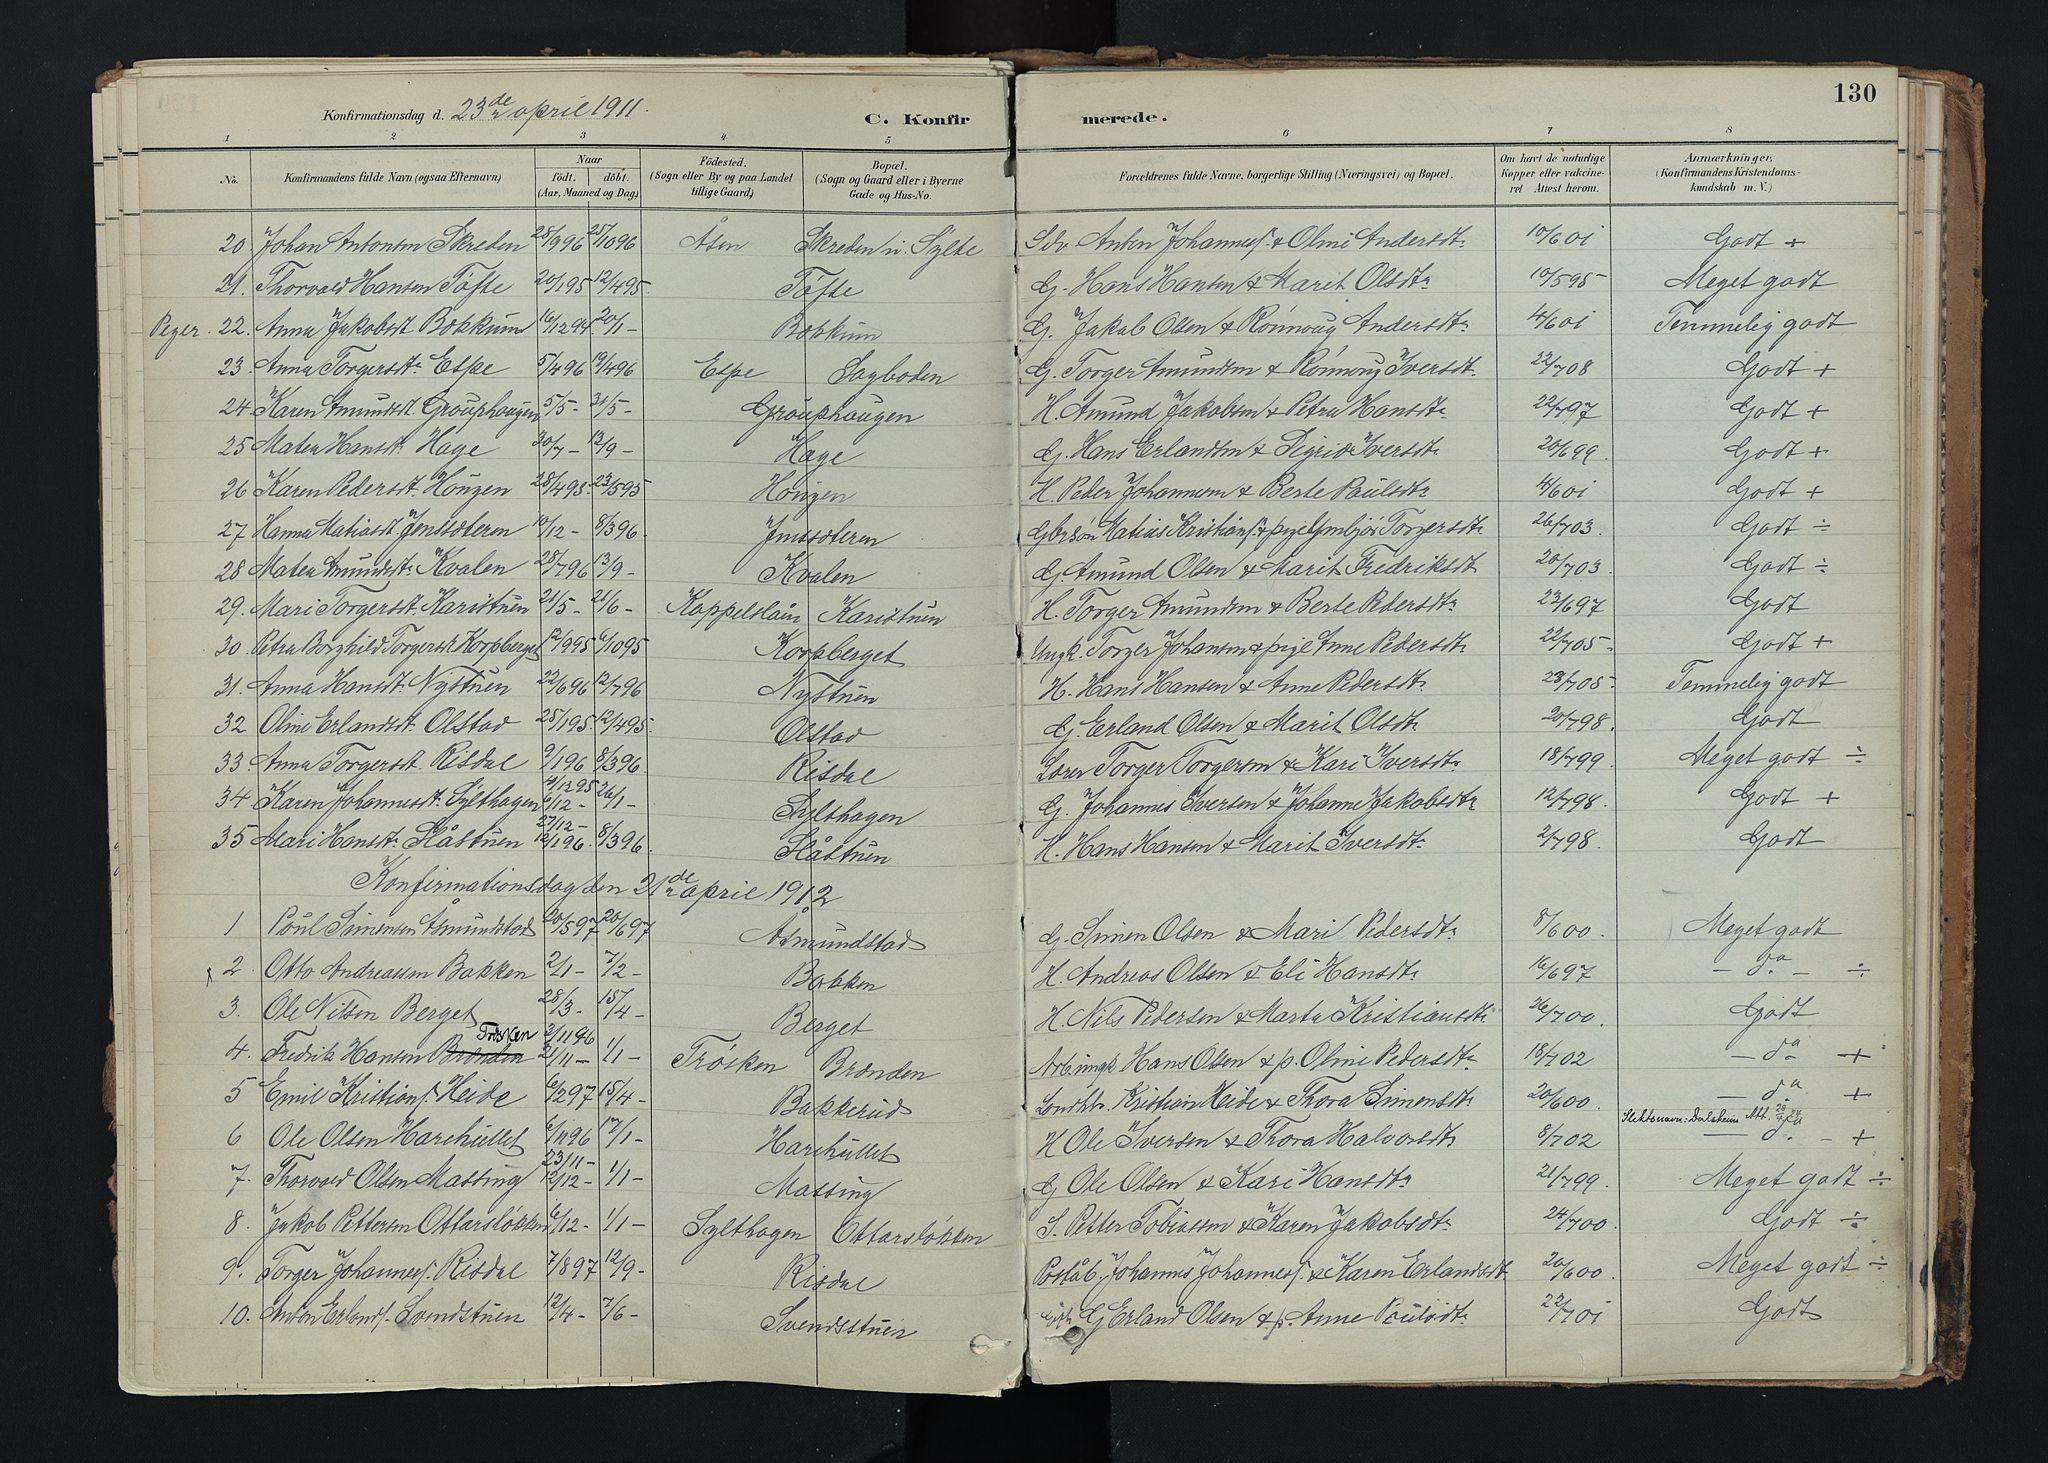 SAH, Nord-Fron prestekontor, Ministerialbok nr. 5, 1884-1914, s. 130